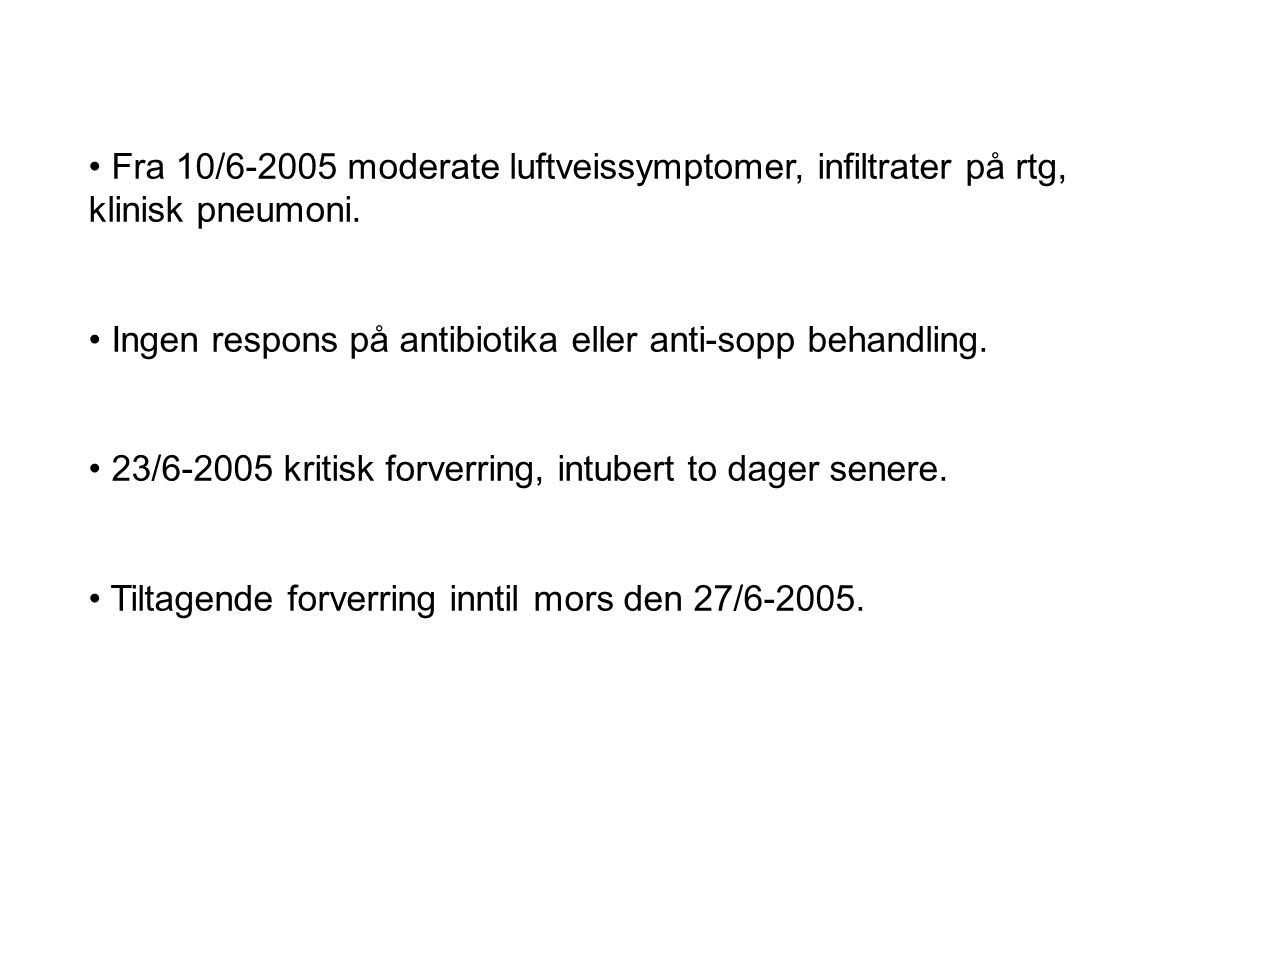 Fra 10/6-2005 moderate luftveissymptomer, infiltrater på rtg, klinisk pneumoni.